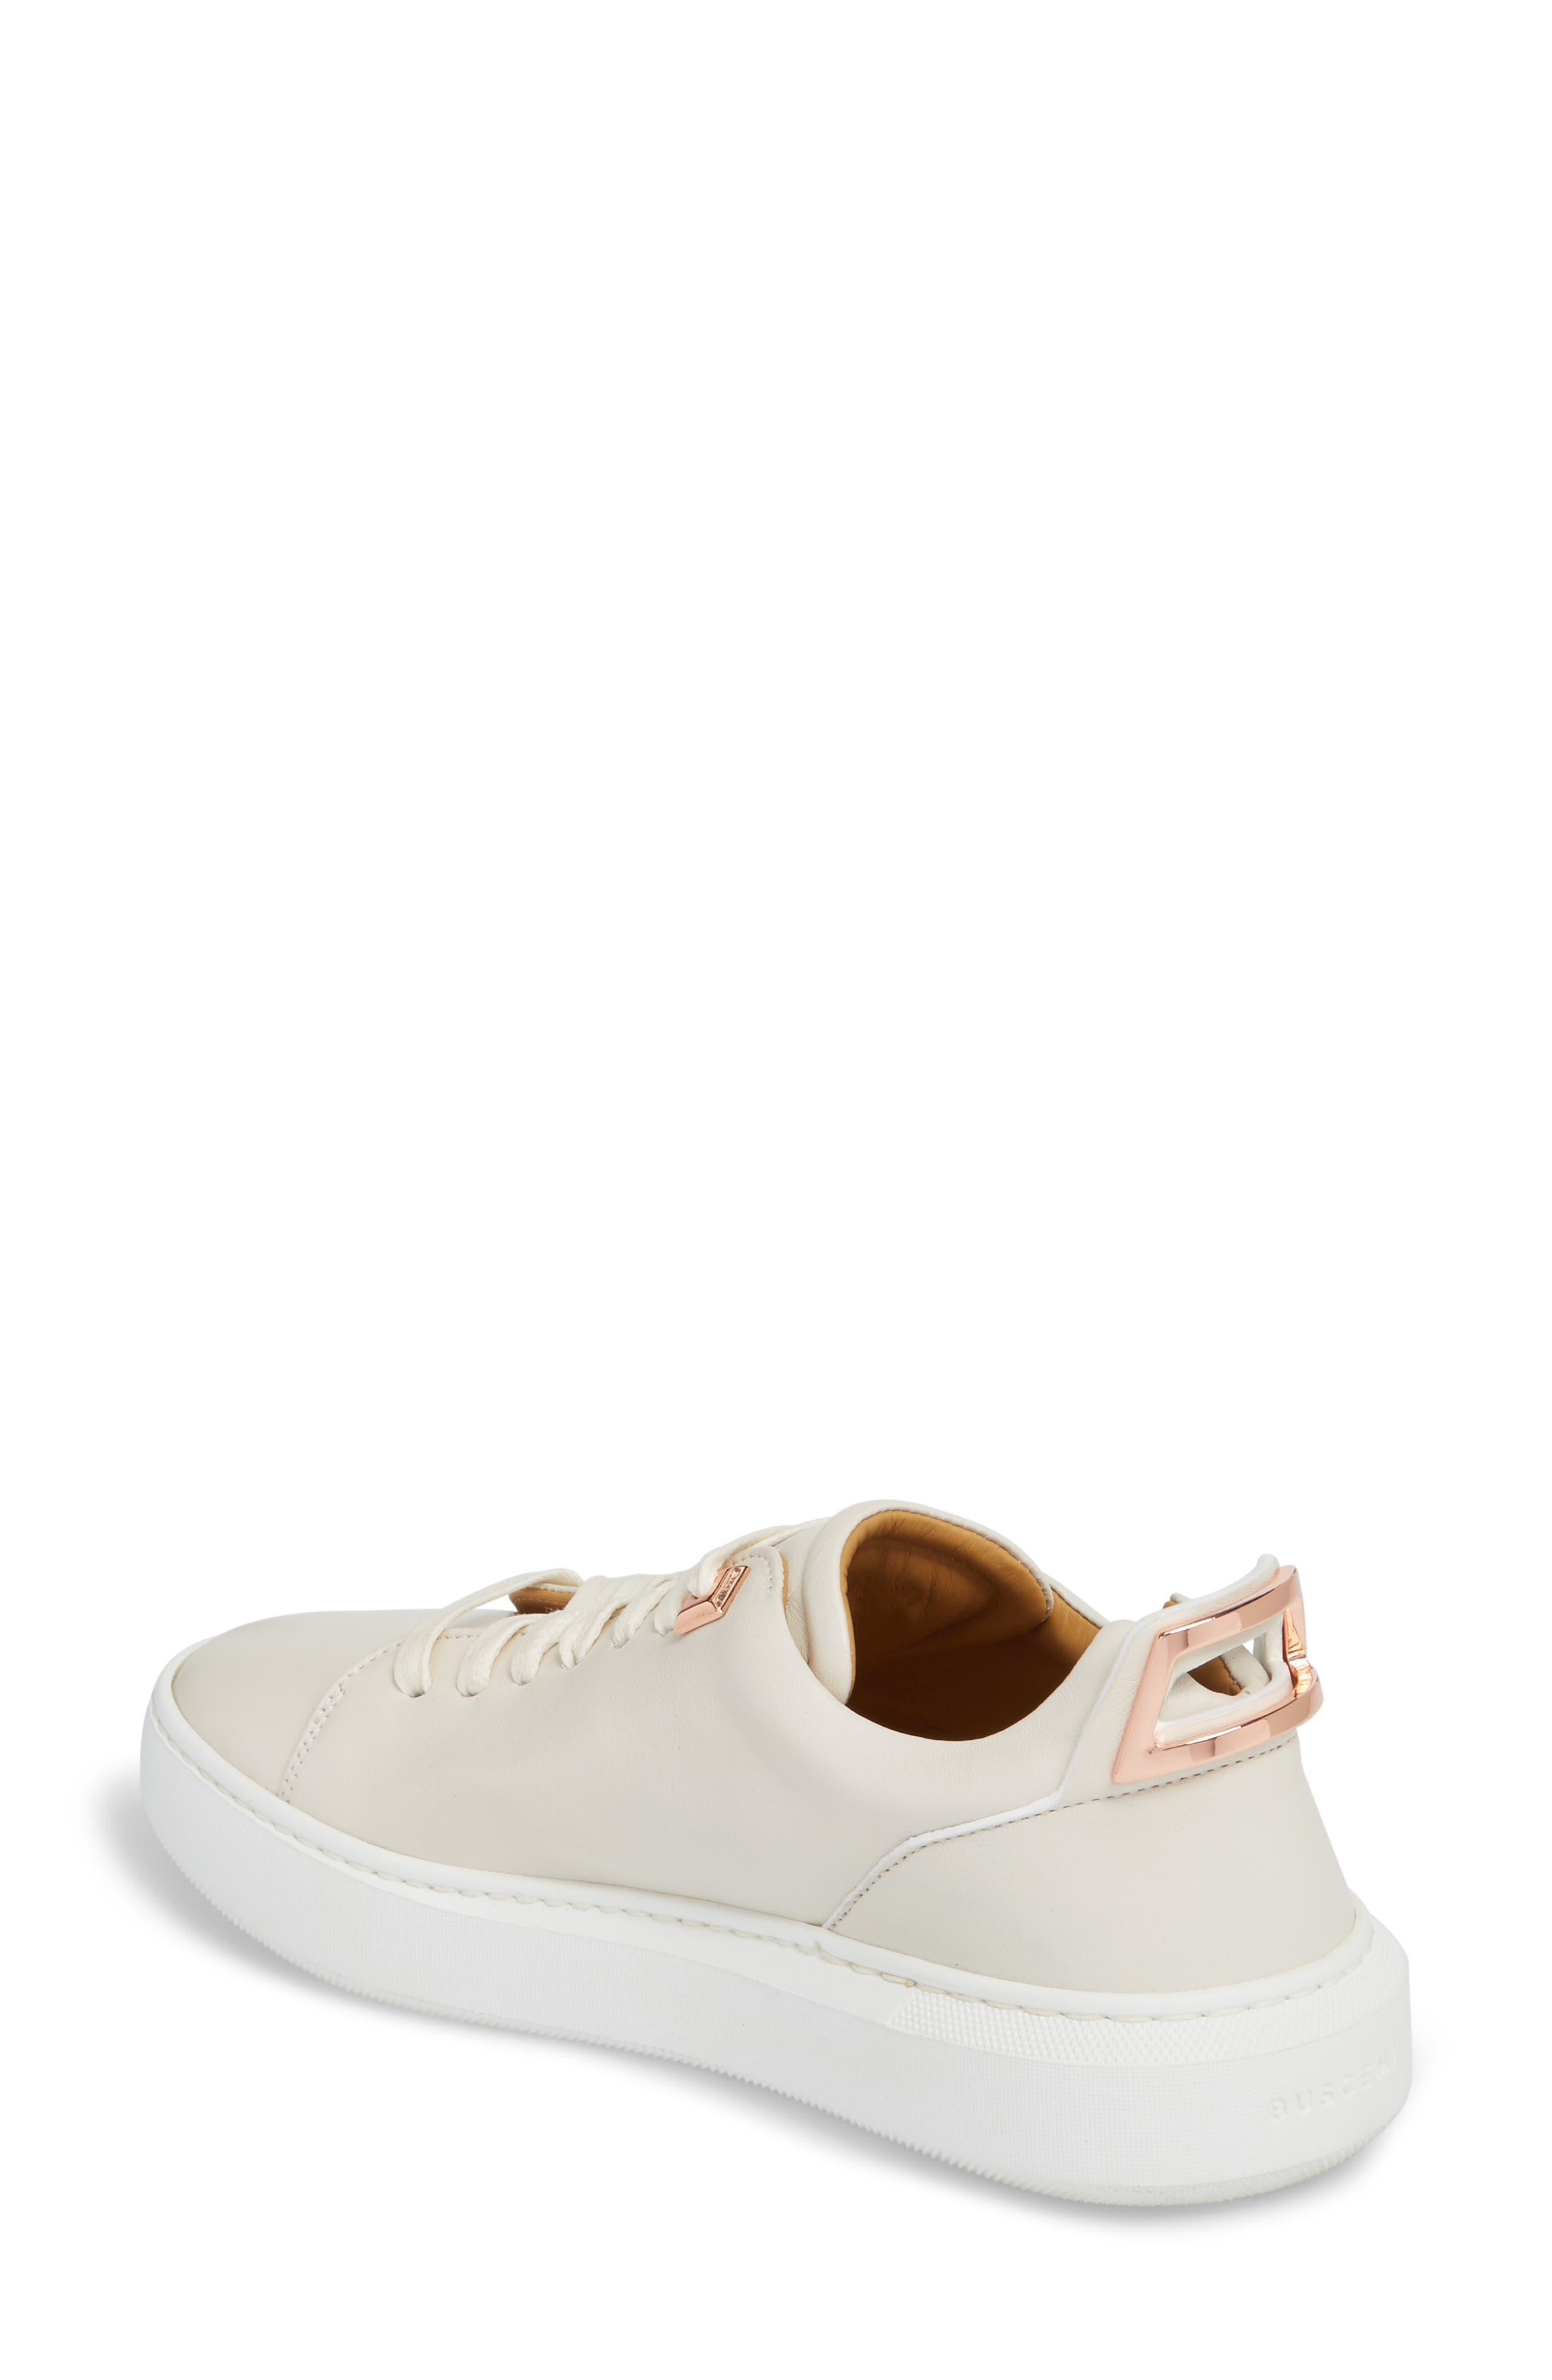 Uno Low Top Sneaker,                             Alternate thumbnail 4, color,